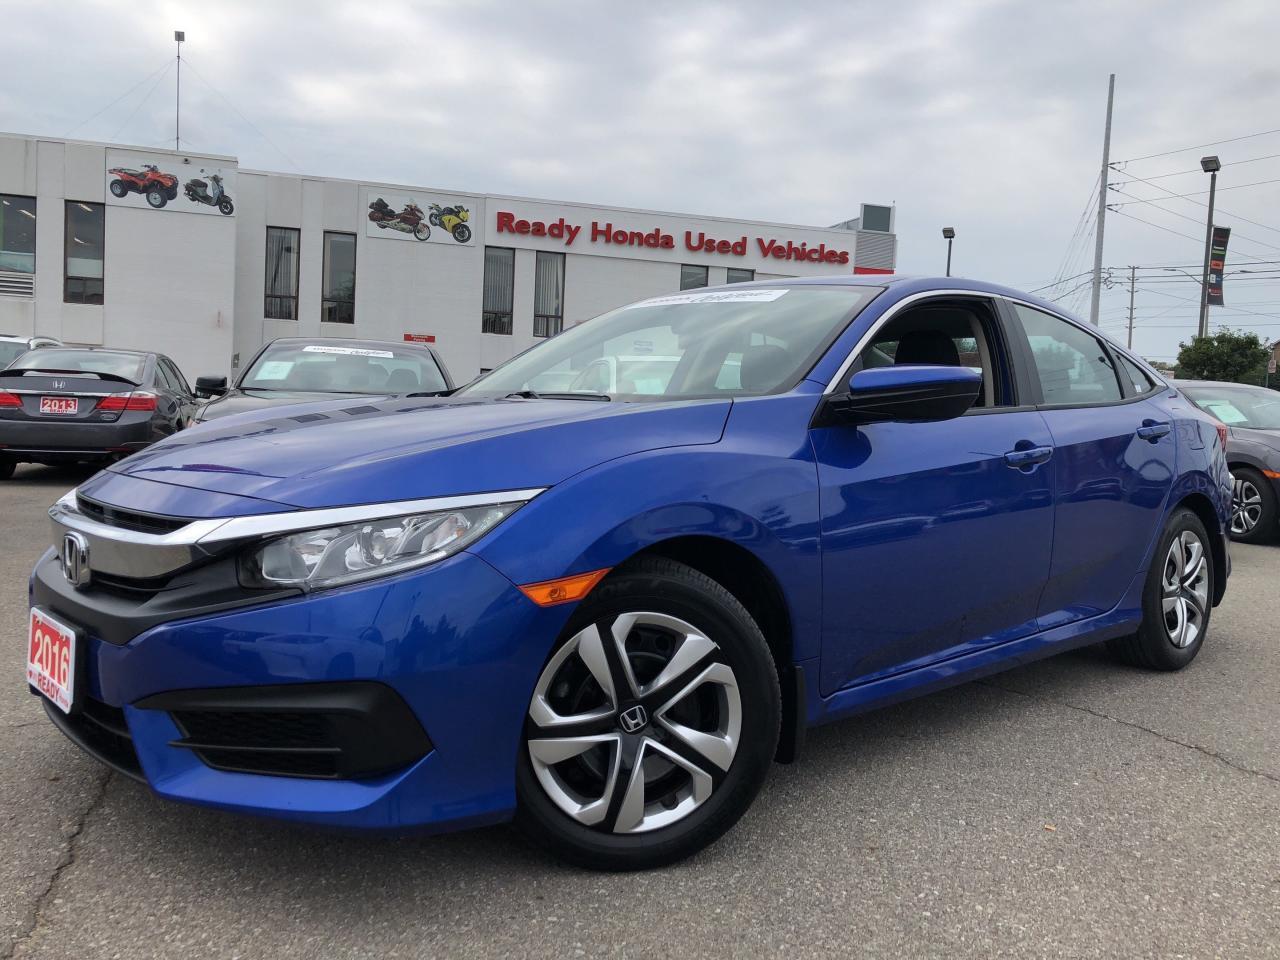 Photo of Blue 2016 Honda Civic